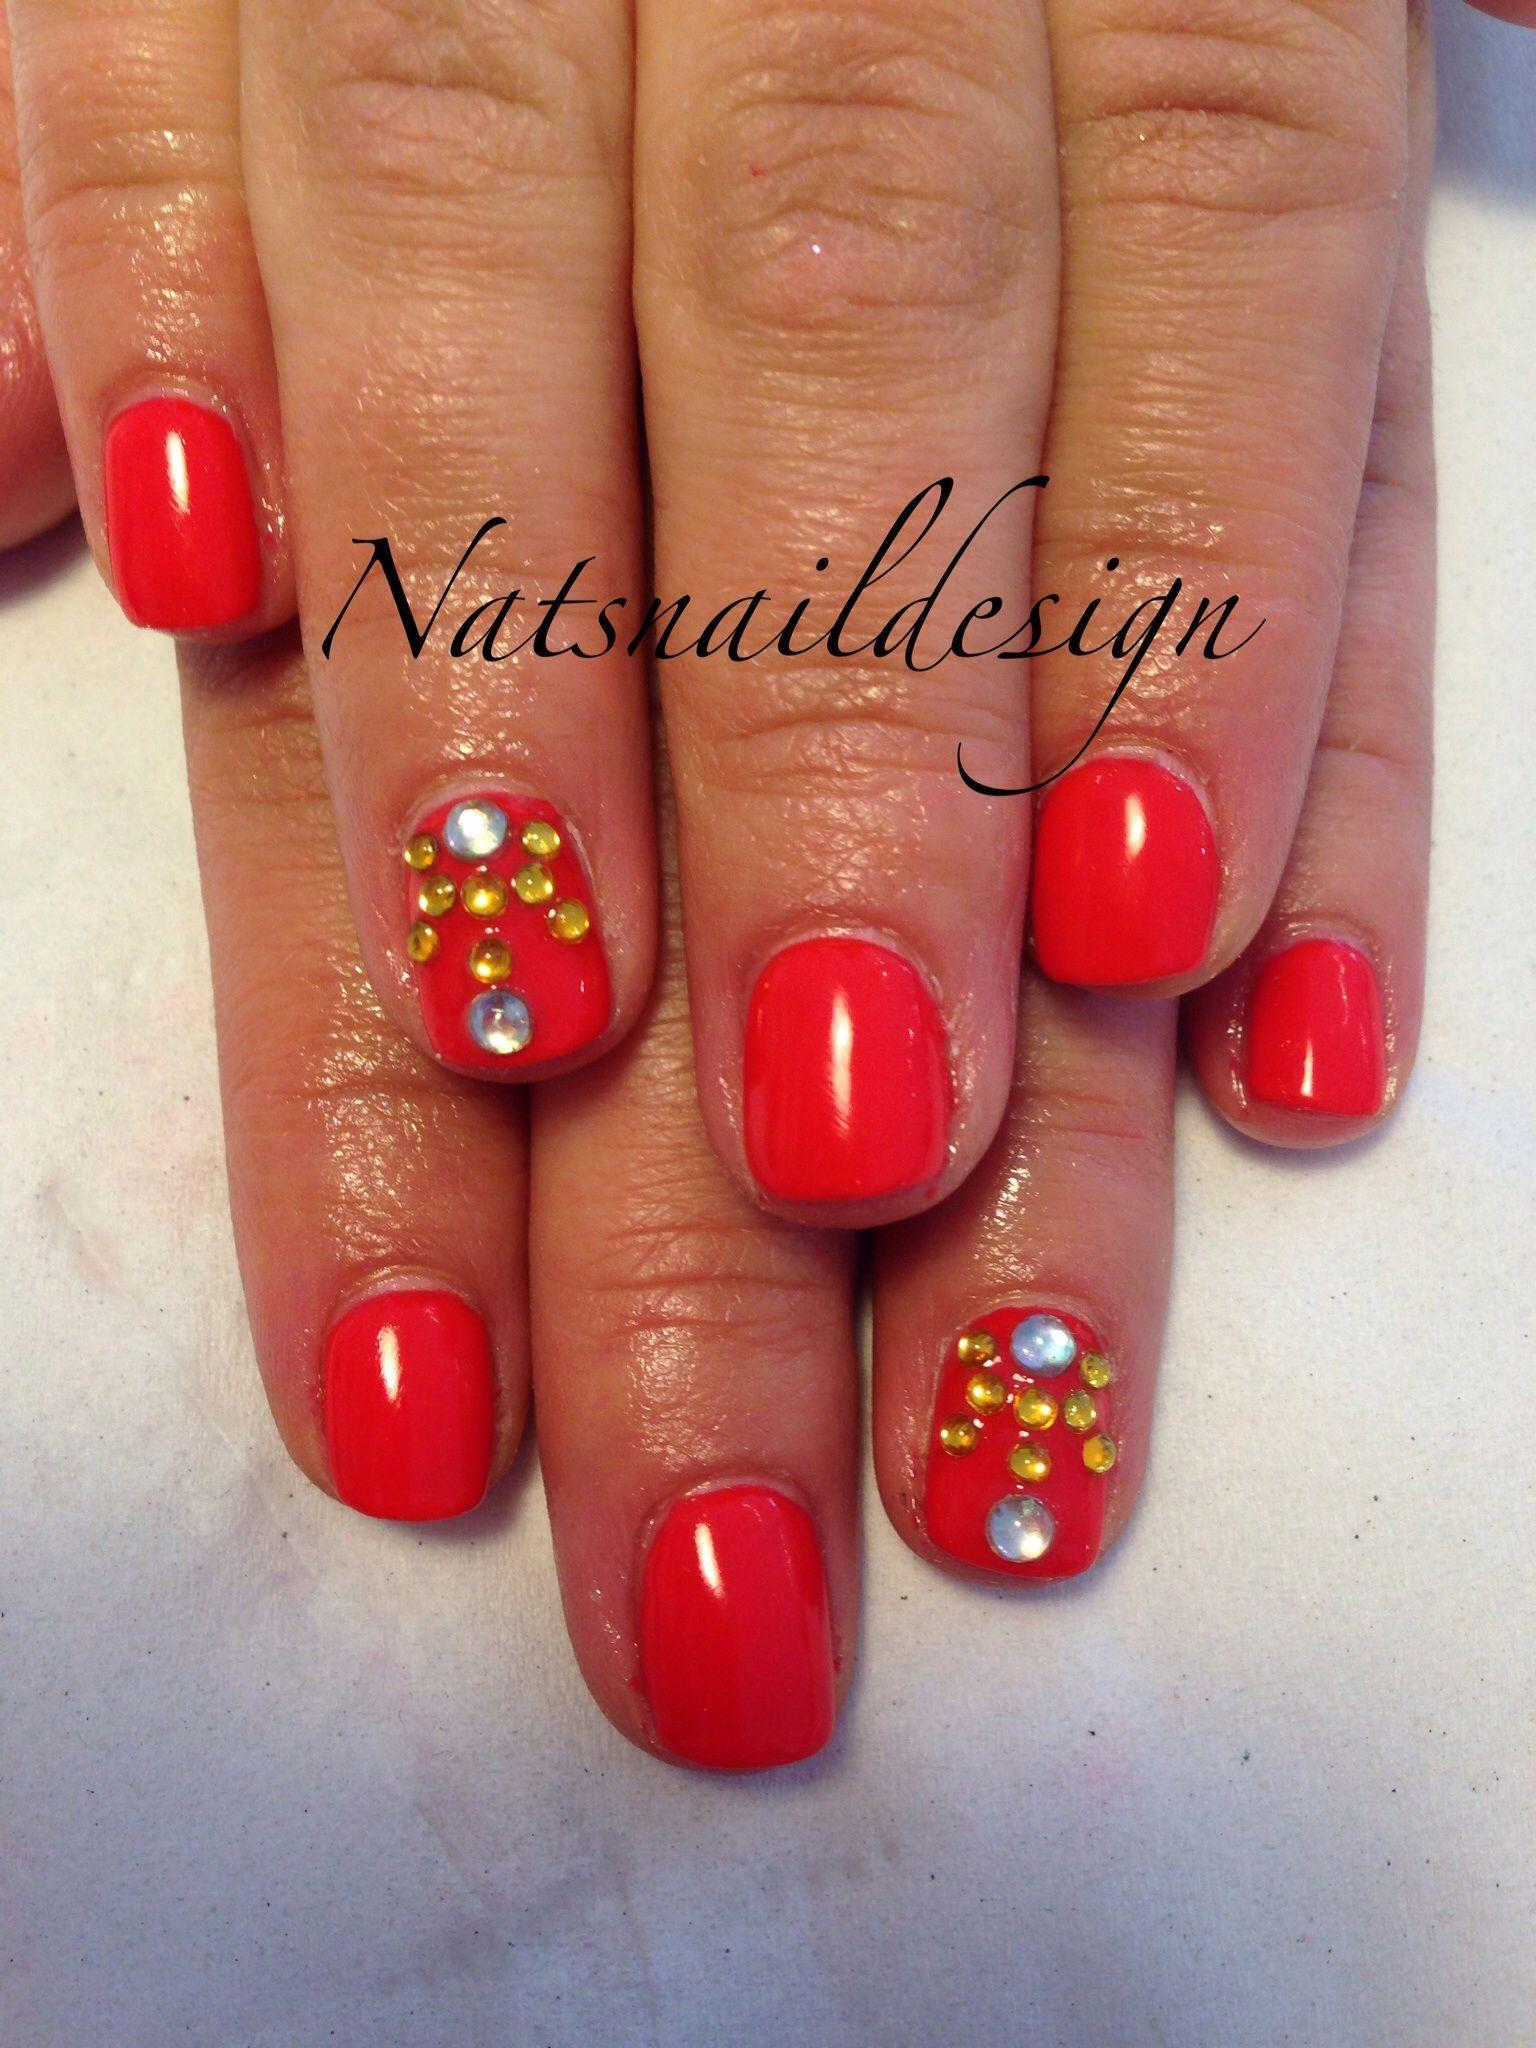 Orange jewelled nails #liverpool #nails #nailart #jewels | Nail Art ...